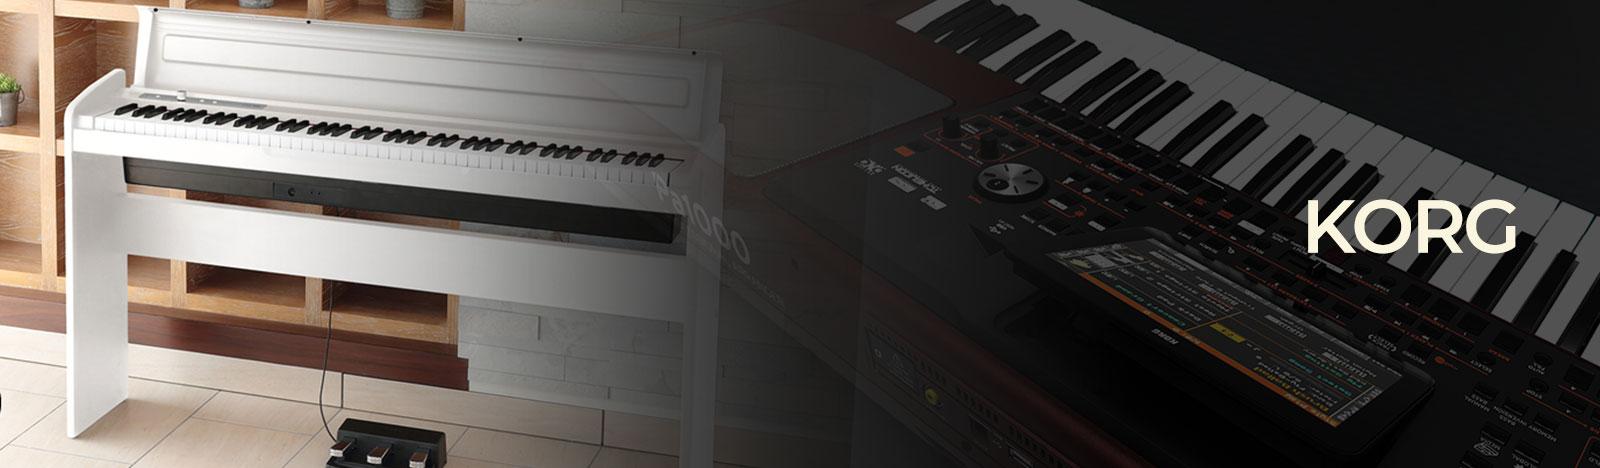 Korg digitale piano